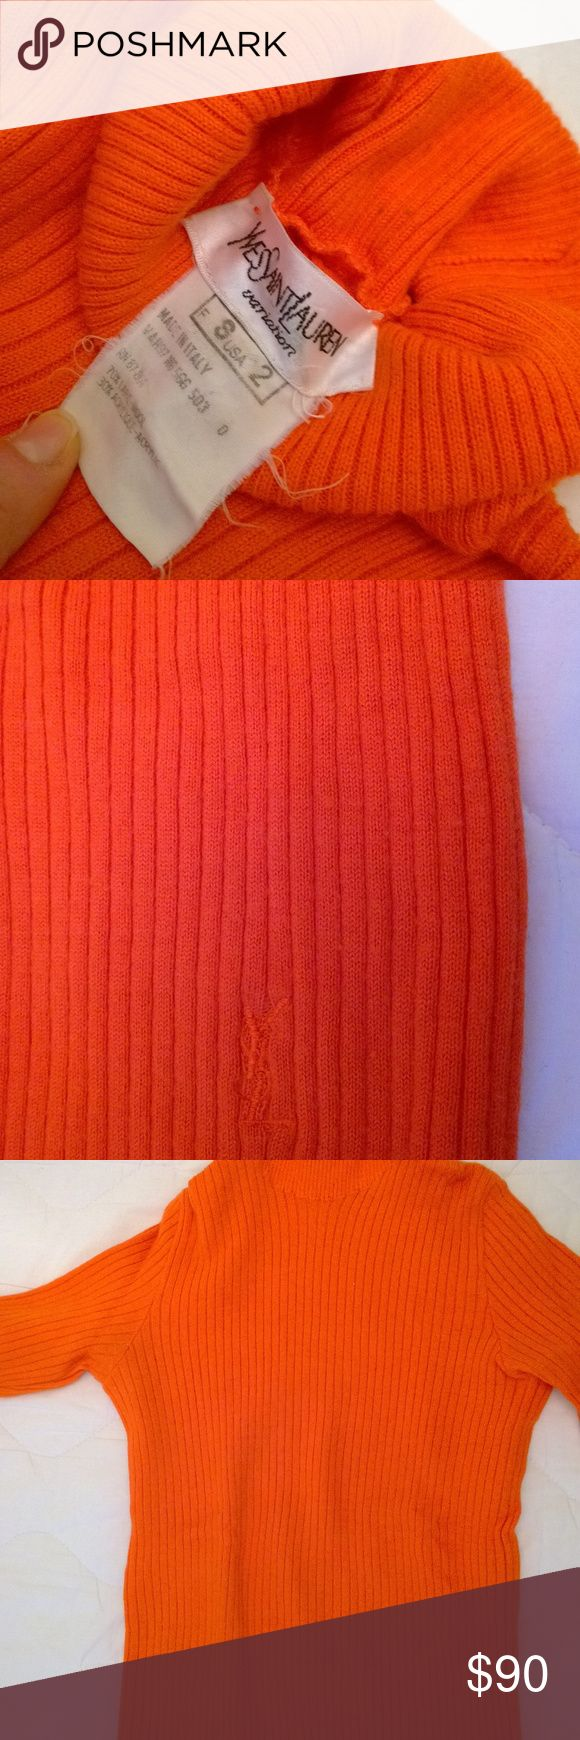 I just added this listing on Poshmark: YVES SAINT LAUREN Orange Sweater, Worn Twice. #shopmycloset #poshmark #fashion #shopping #style #forsale #Yves Saint Laurent #Sweaters